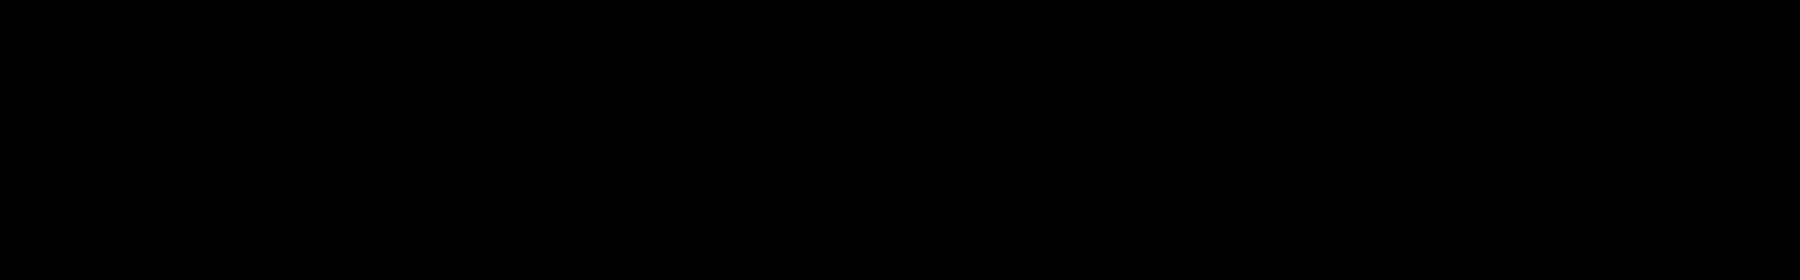 Juno 6 Tech House Loops audio waveform